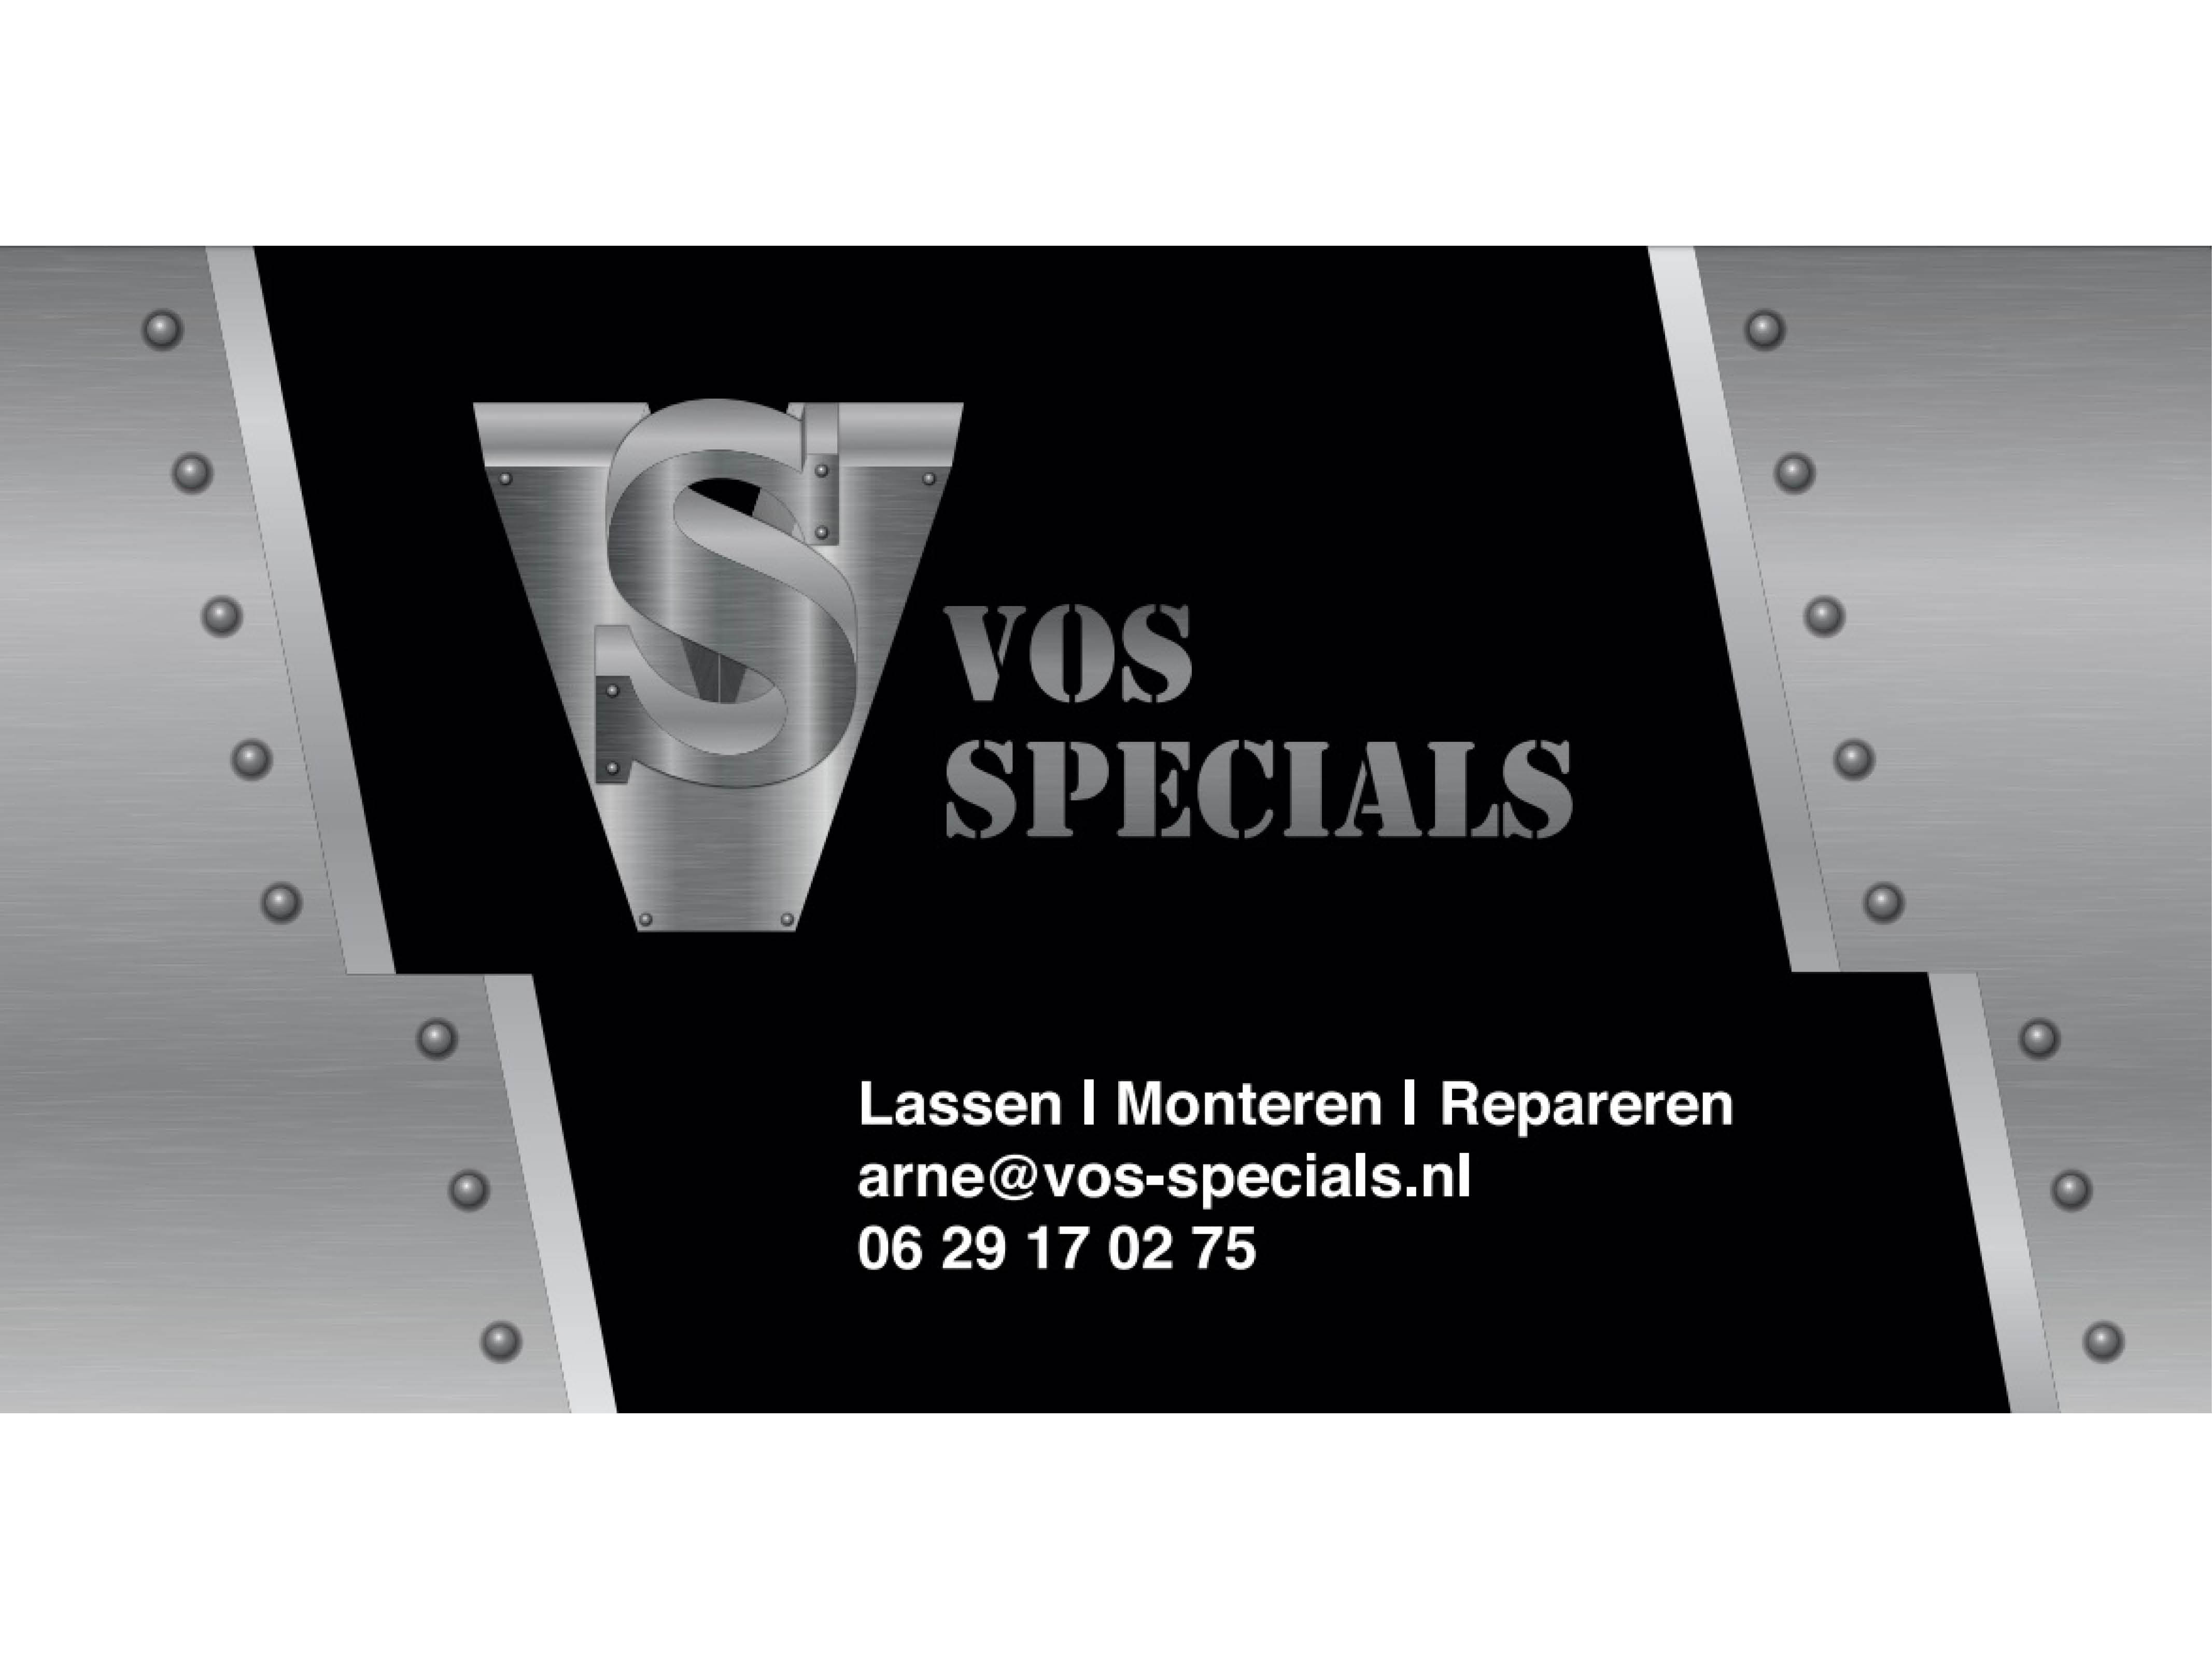 140-Vos-specials.jpg